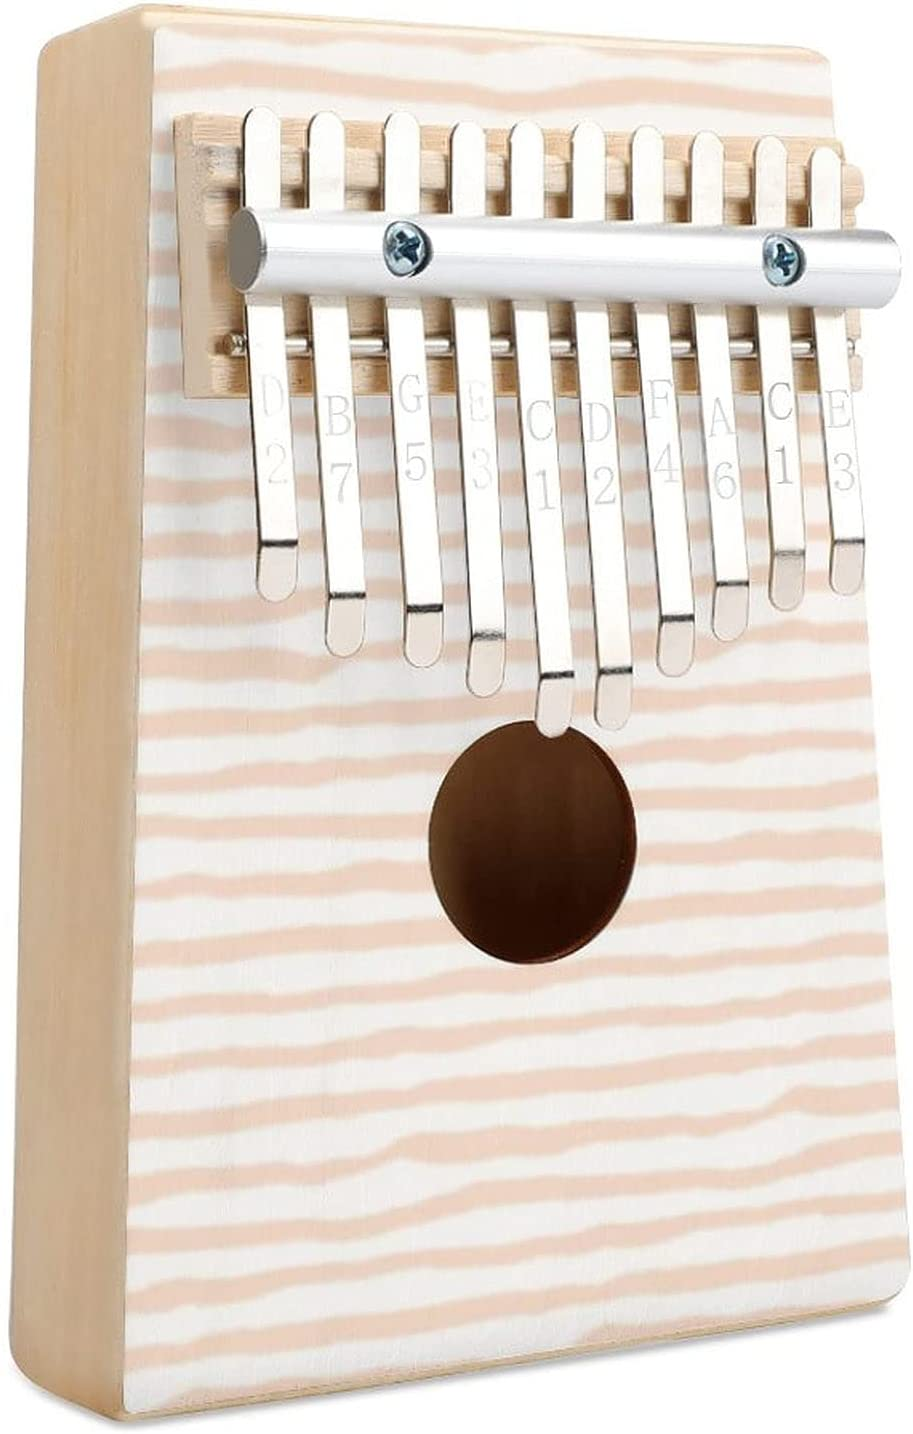 Light Peach San Antonio Mall Stripes She Fierce Kalimba Thumb Key 10 Ranking TOP16 Finger Piano